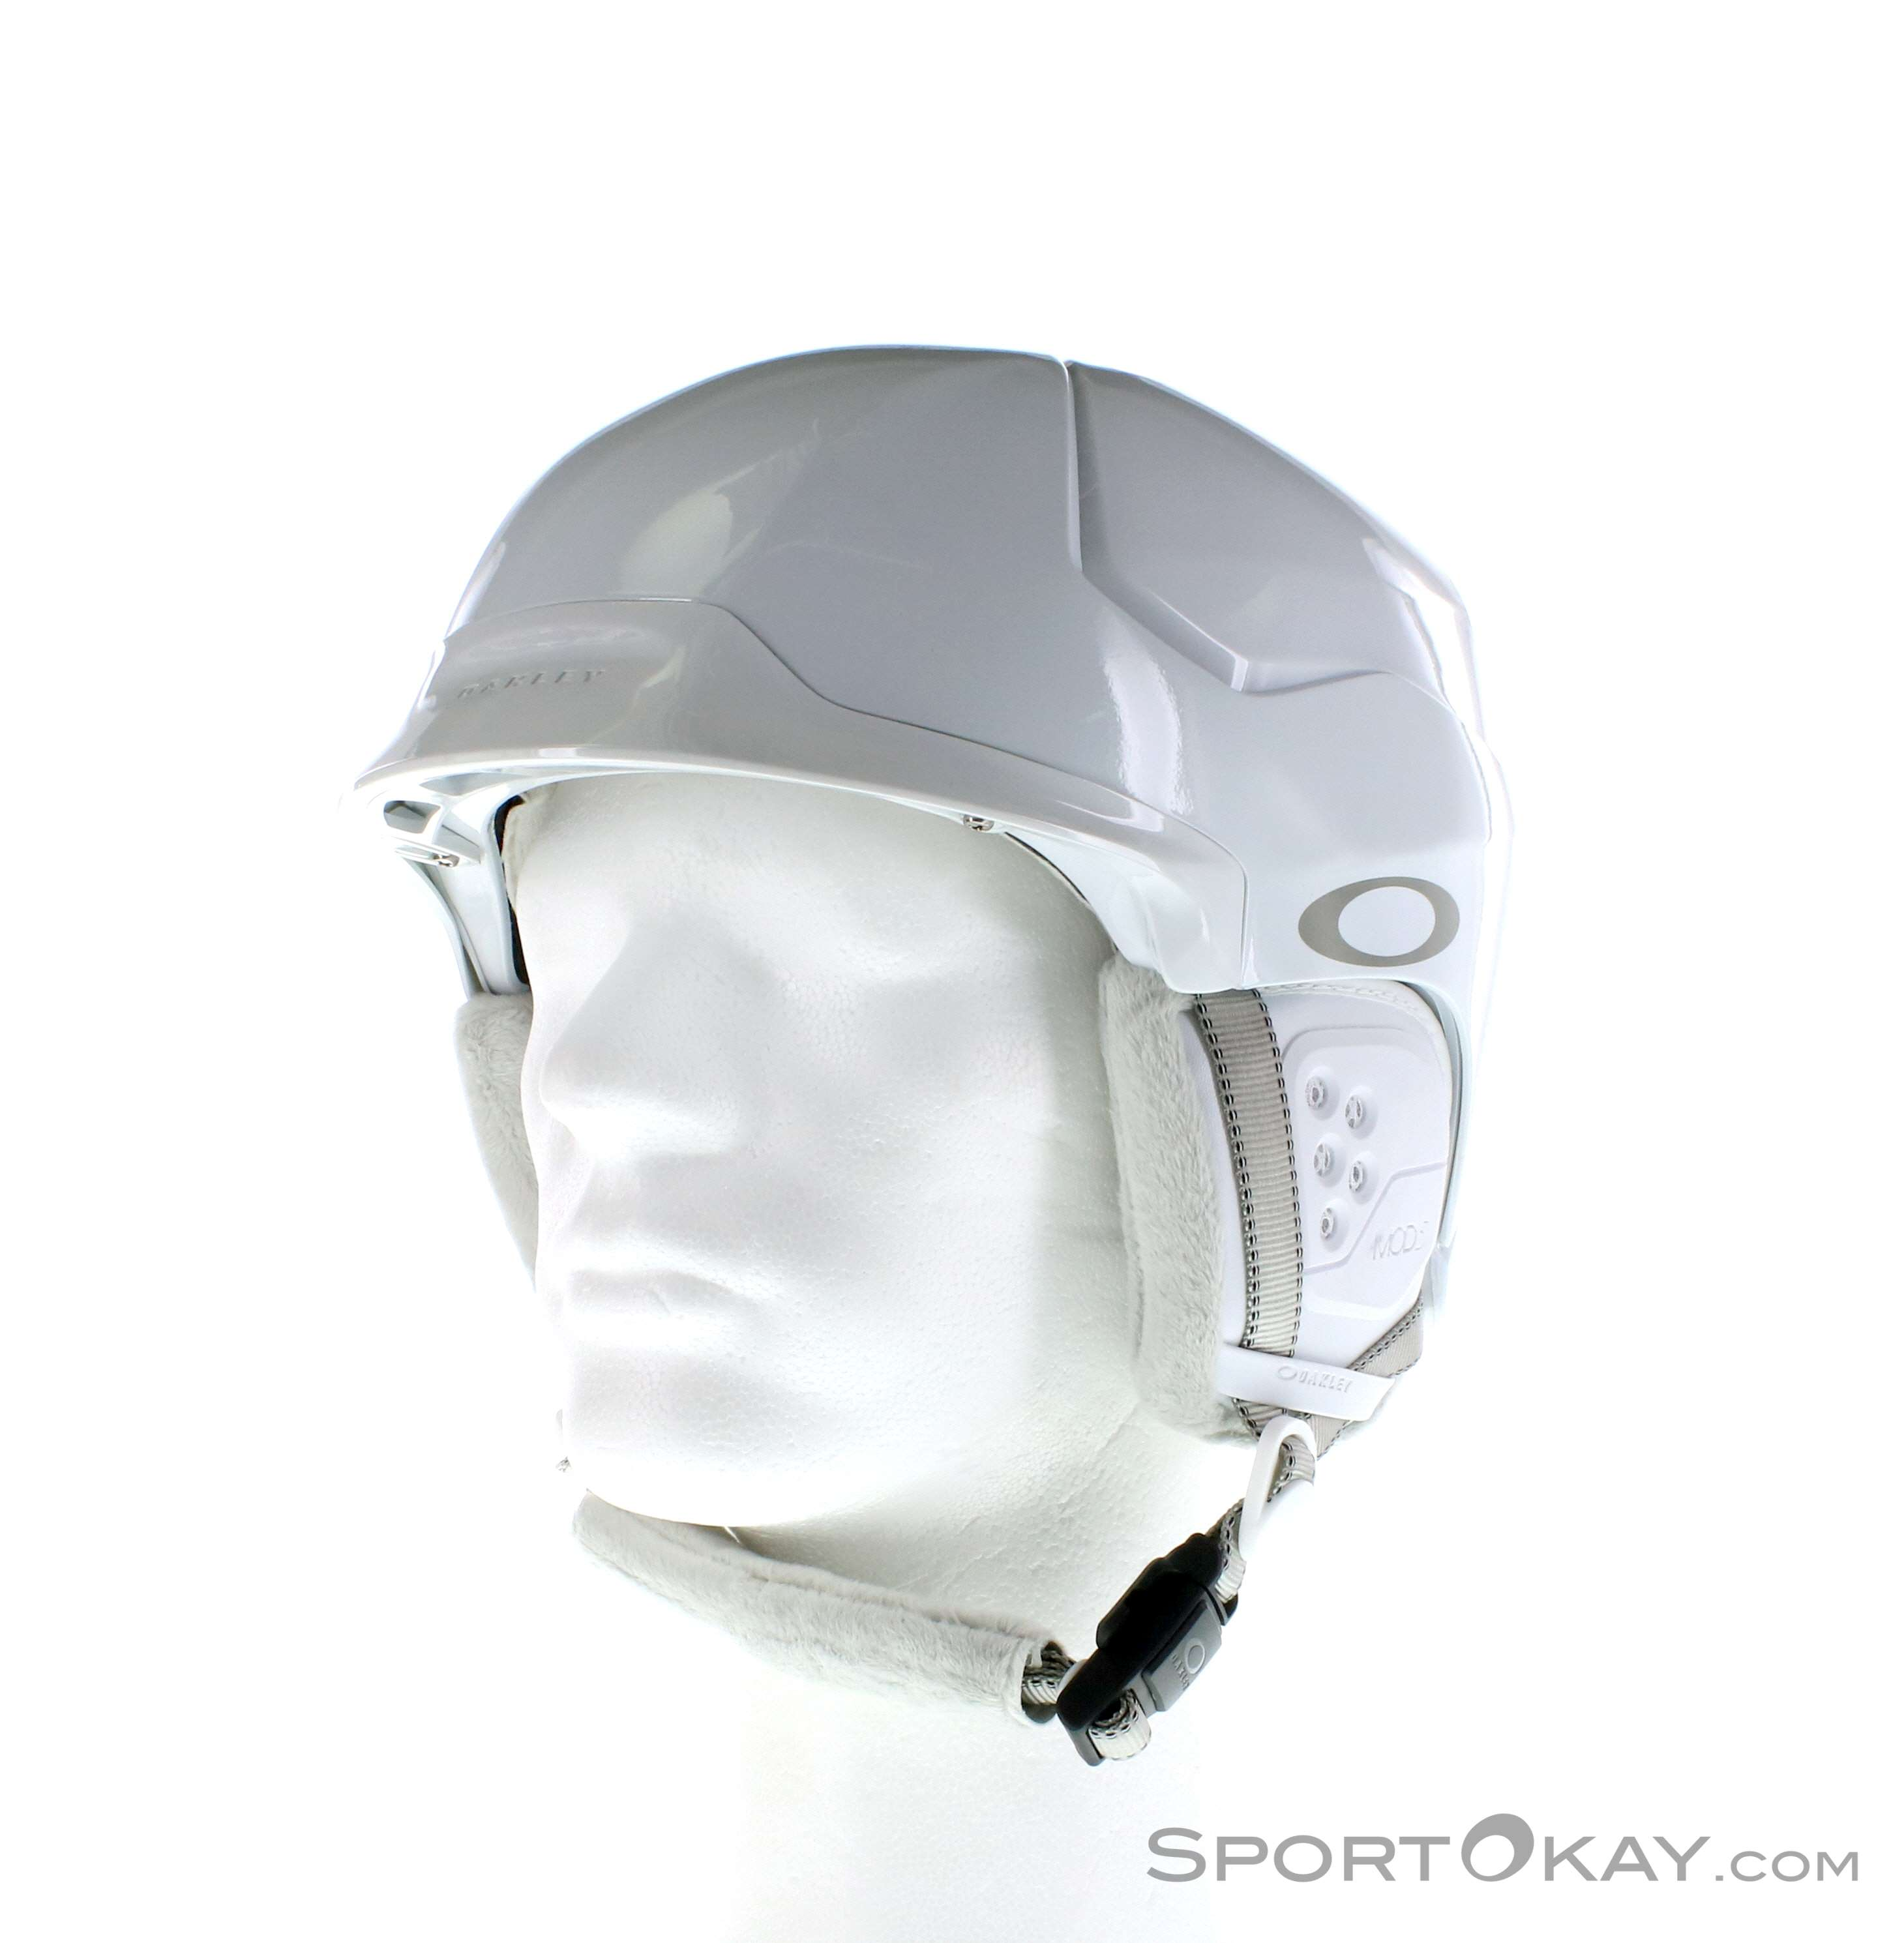 7d9af054d5 Casques de ski Archives - Le Blog eben. Oakley Mod 5 Casco da Sci - Caschi  - Caschi e accessori - Sci Freeride - Tutti Casco sci Oakley MOD5 Factory  Pilot ...